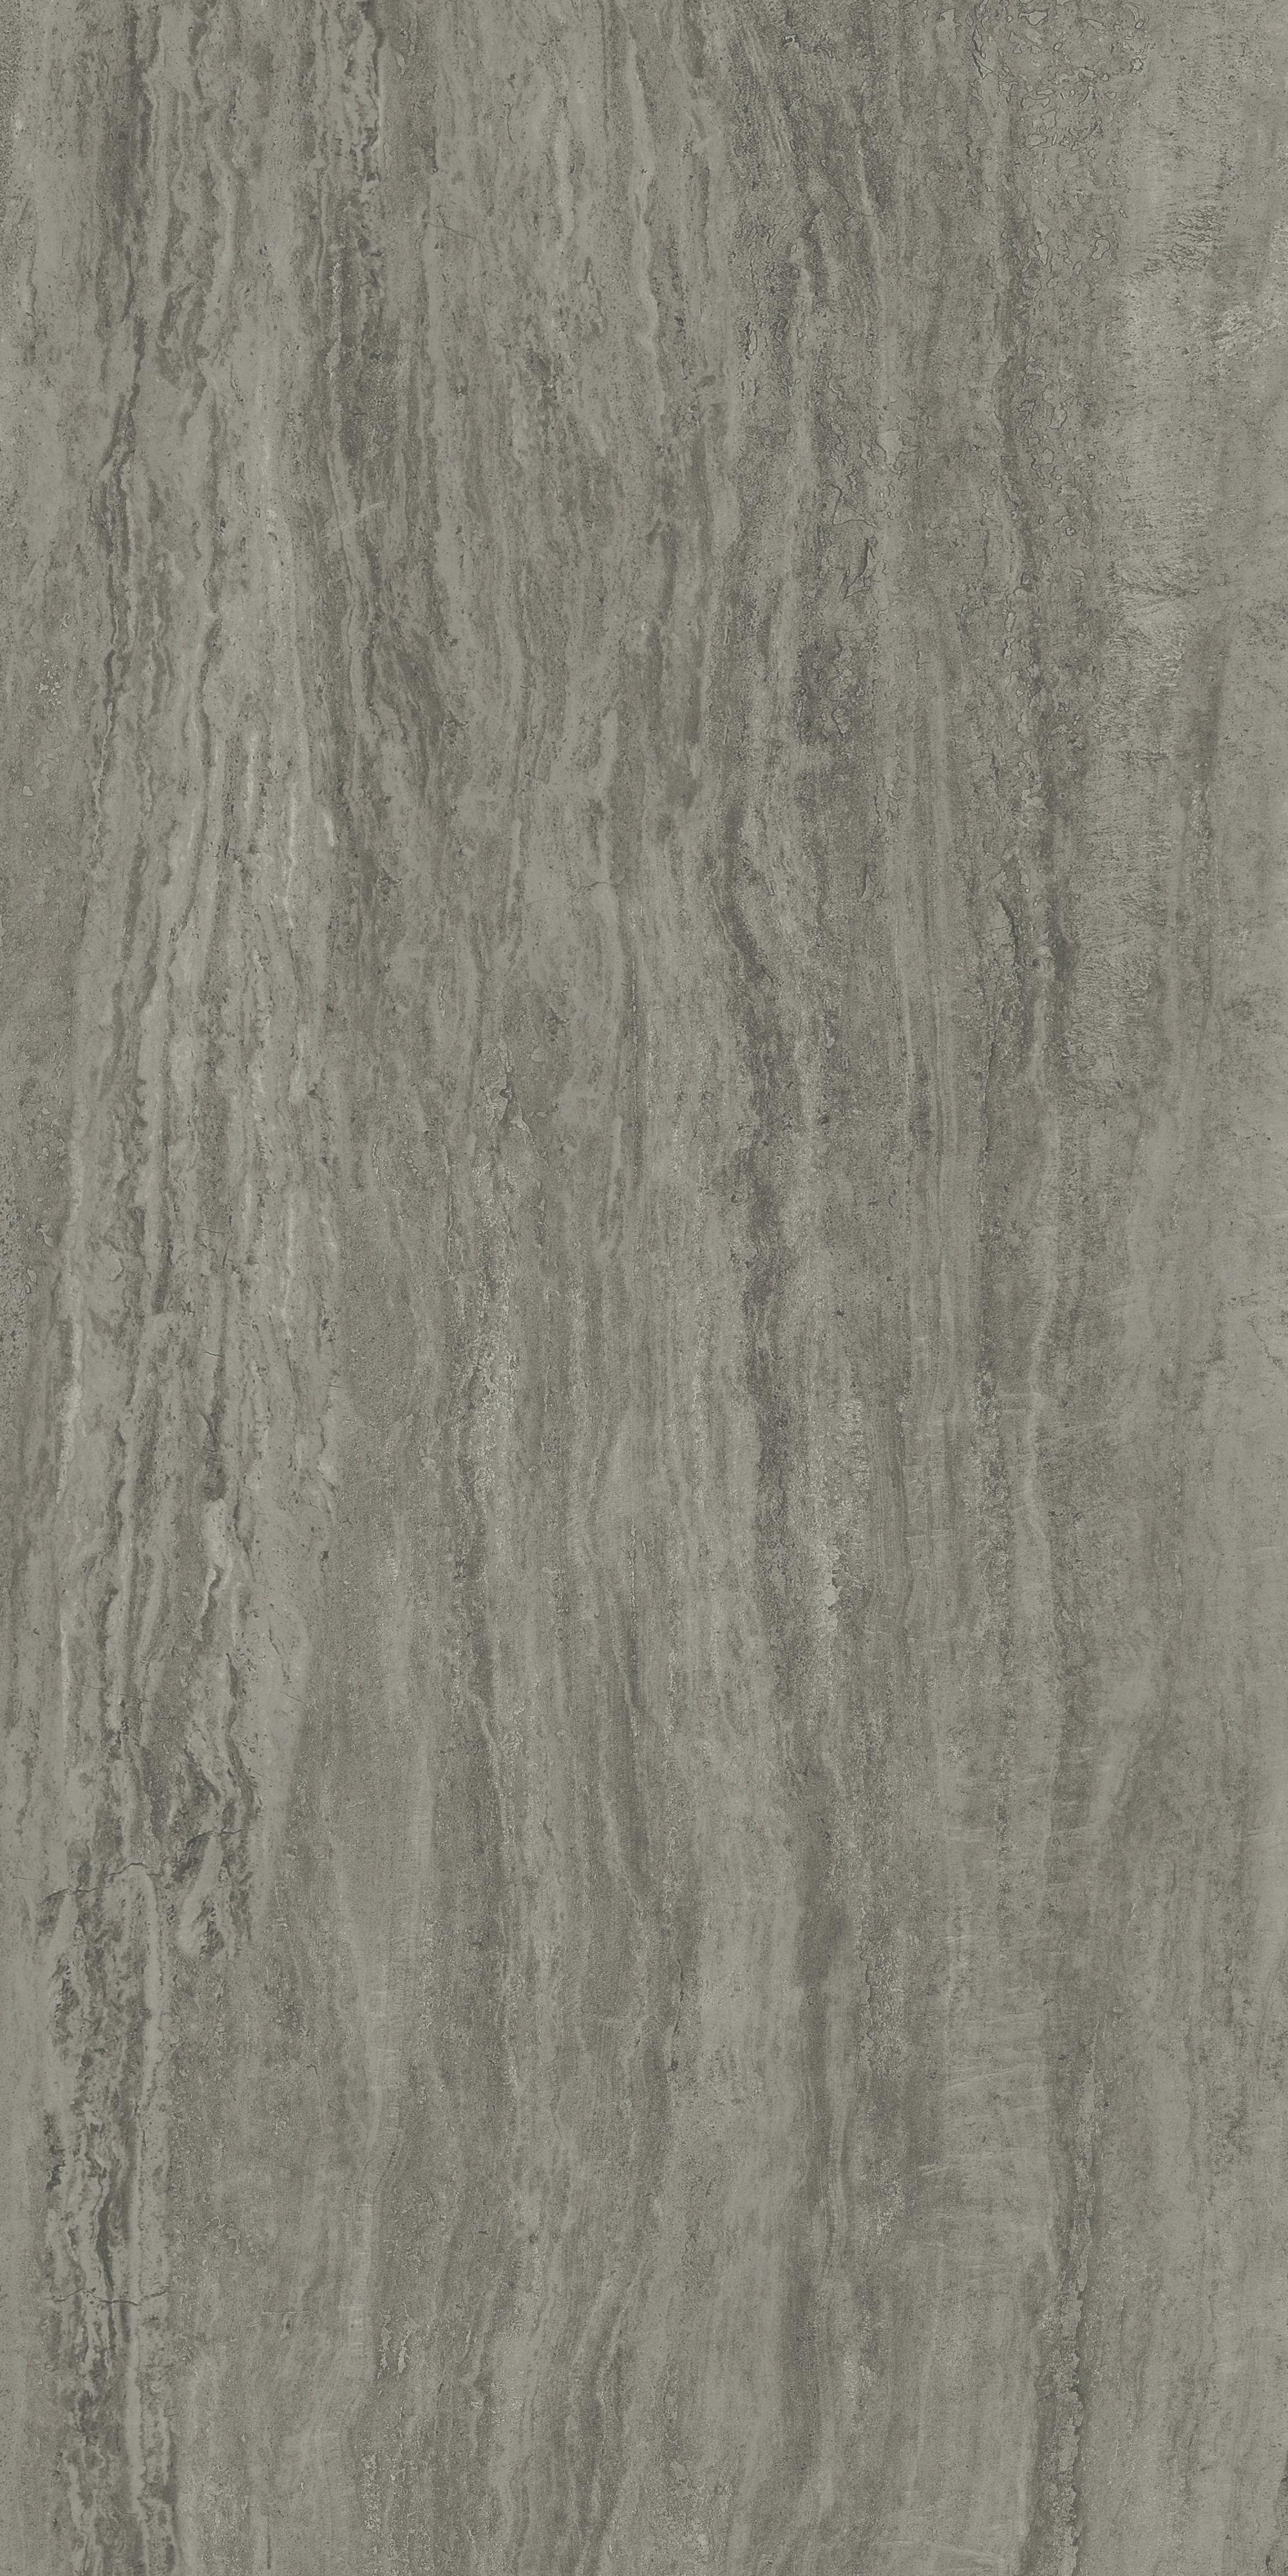 Anatolia mink stone effect plain porcelain wall floor tile pack anatolia mink stone effect plain porcelain wall floor tile pack of 6 l600mm w300mm dailygadgetfo Choice Image